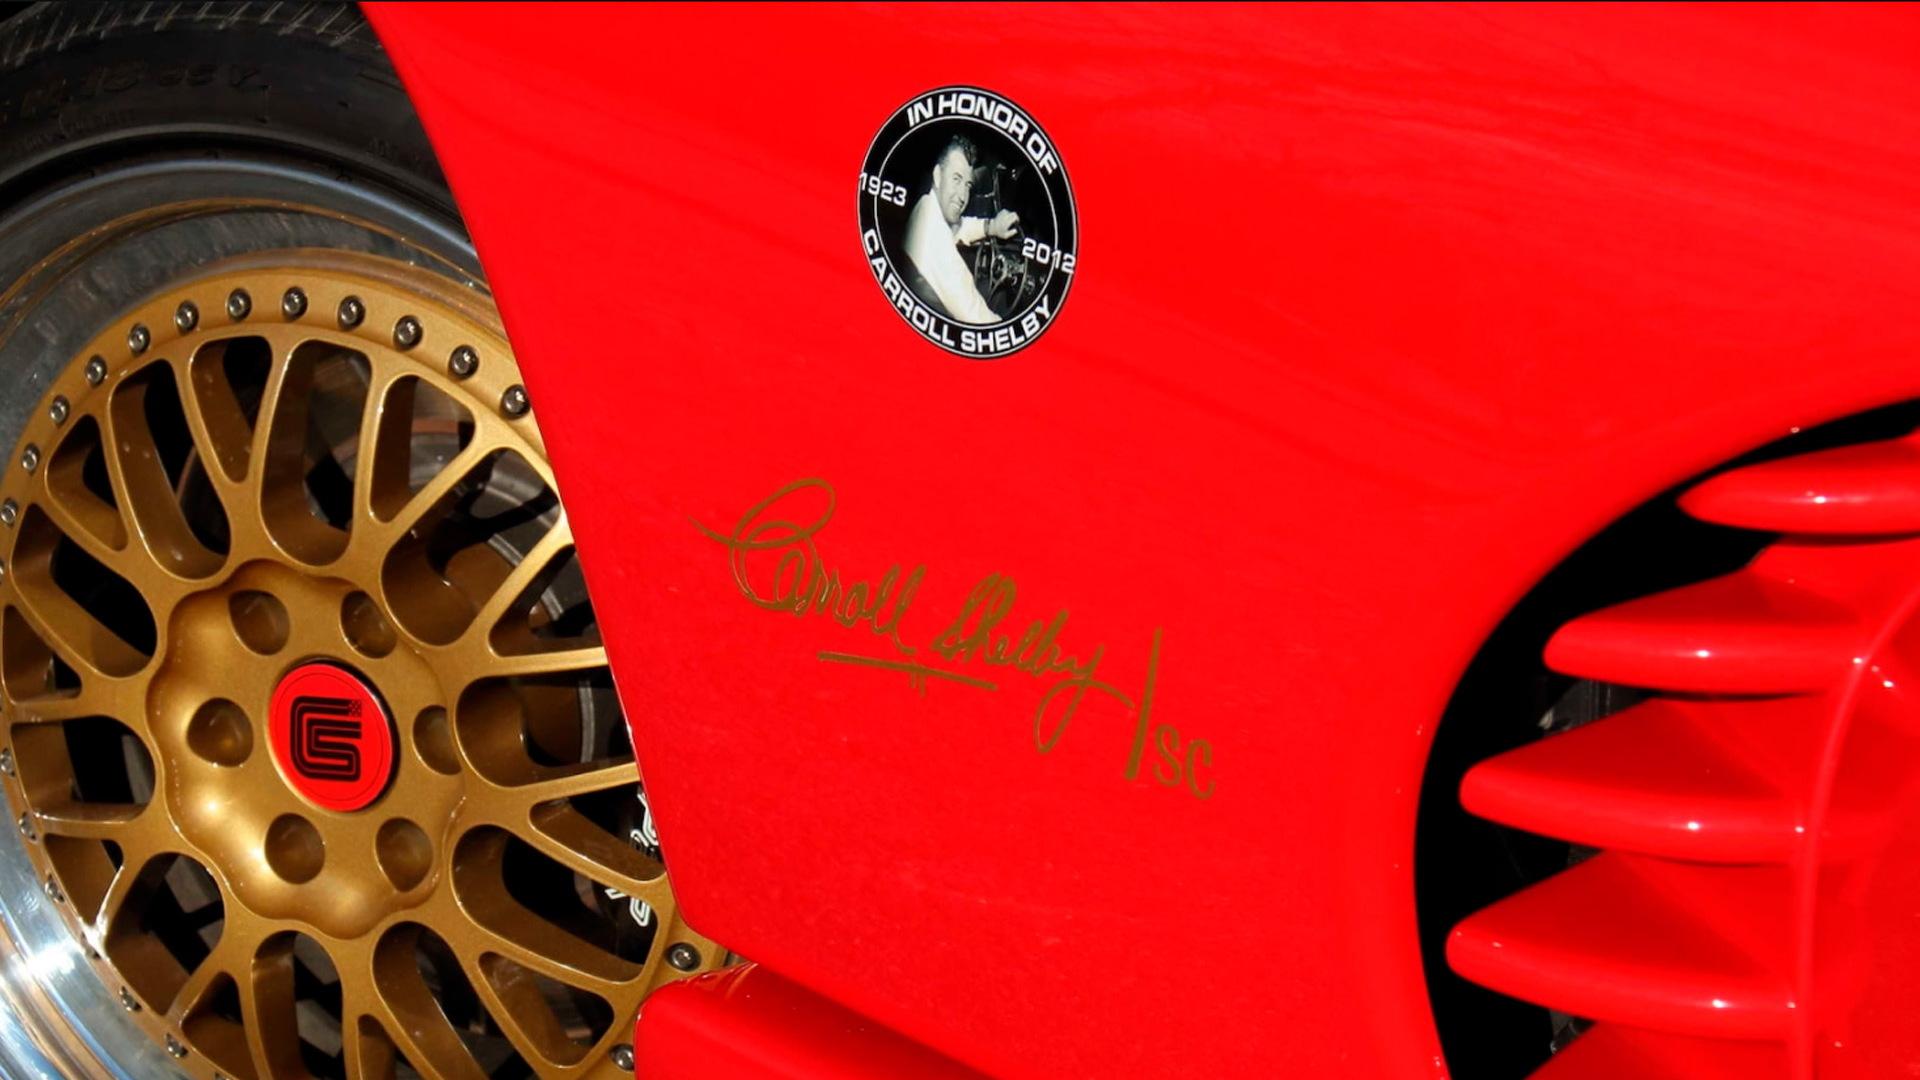 1997 Dodge Shelby Viper GTS/CS prototype - Photo credit: Mecum Auctions